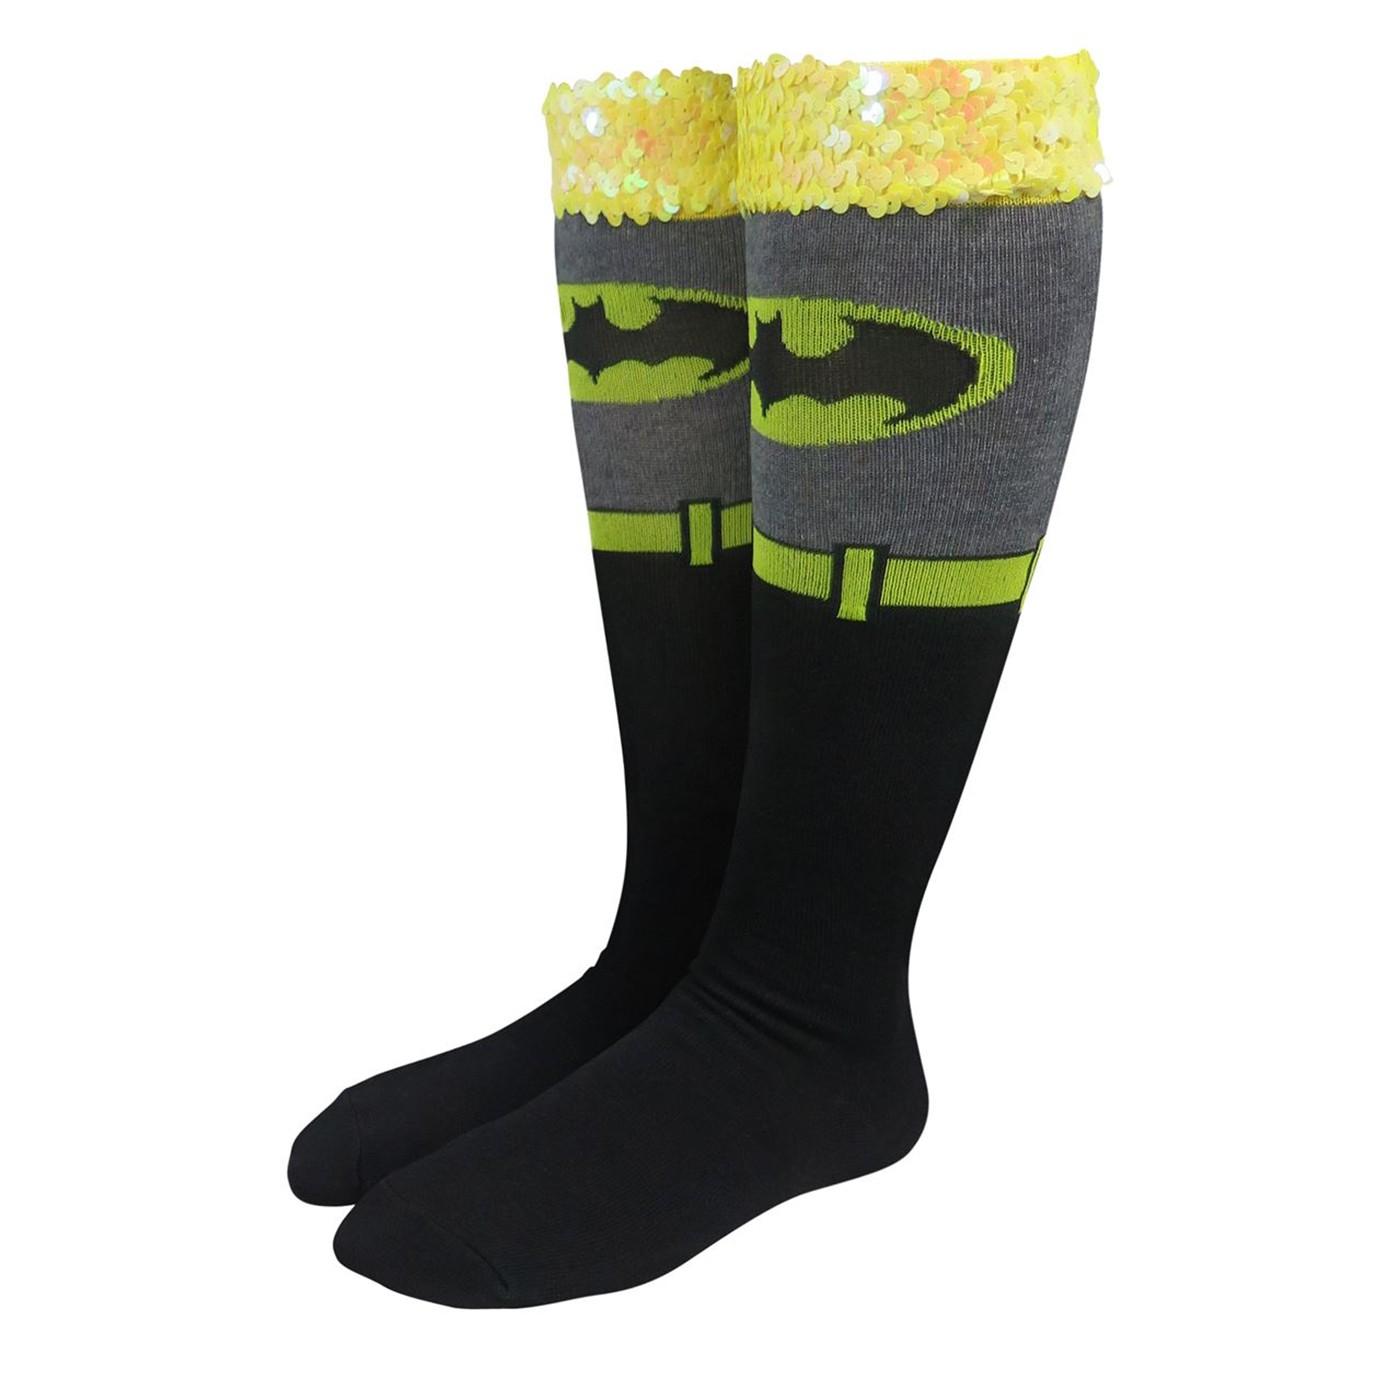 Batman Costume Women's Knee High Socks